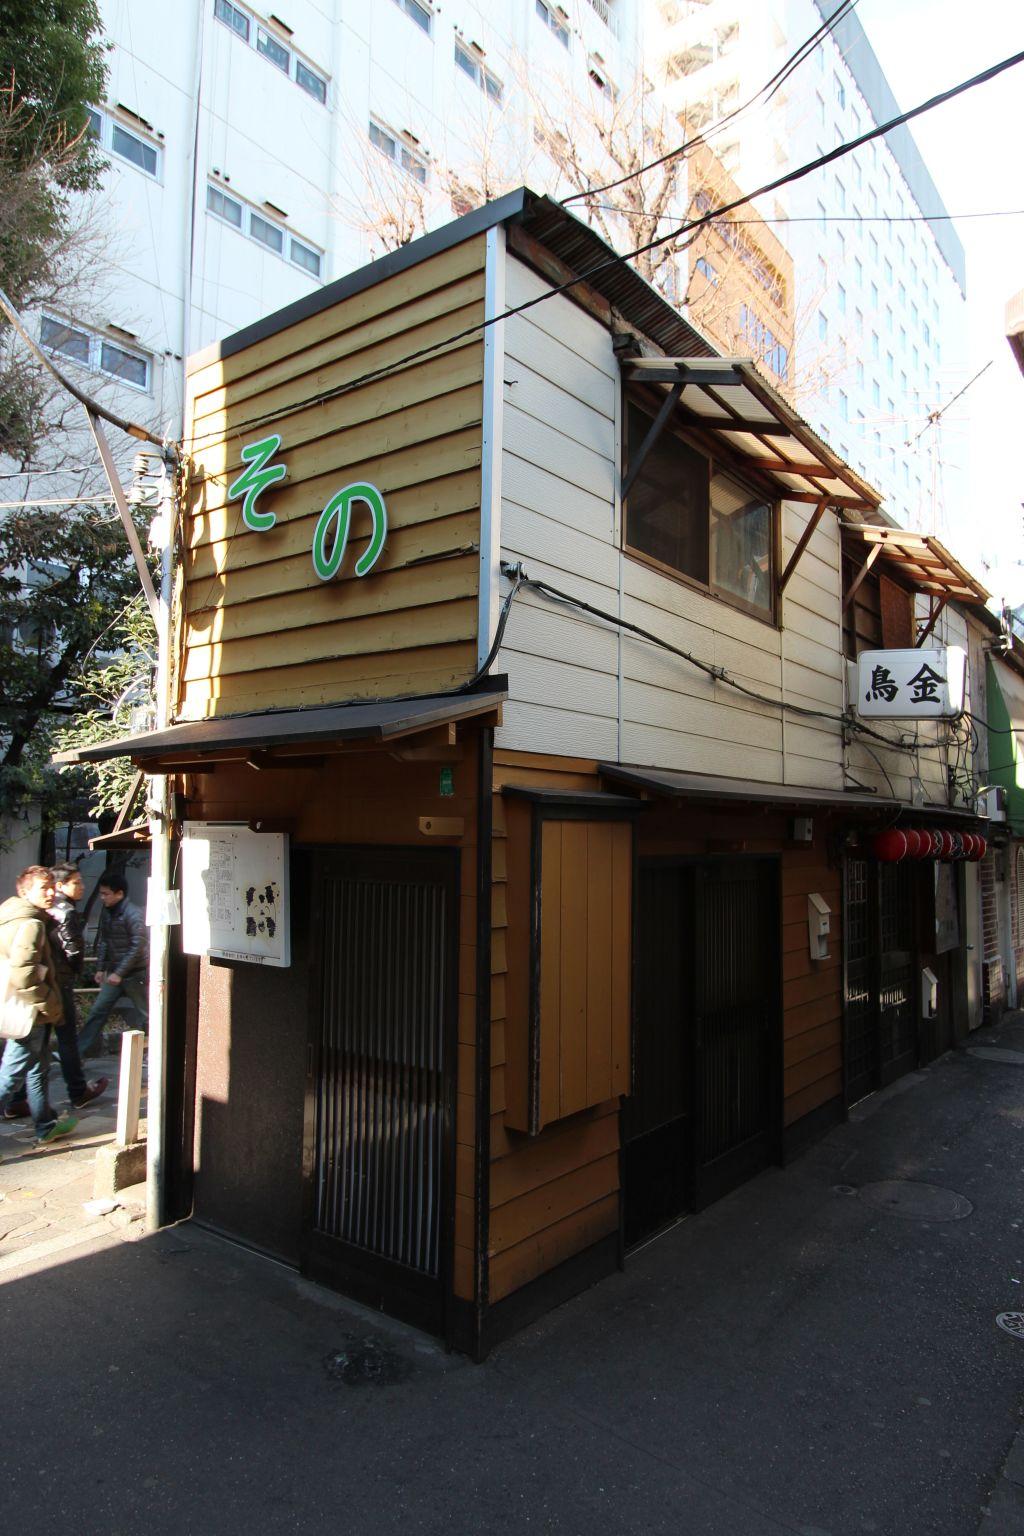 A_tiny_restaurant_in_Tokyo_Pix_John_Doyle_mh2rlo